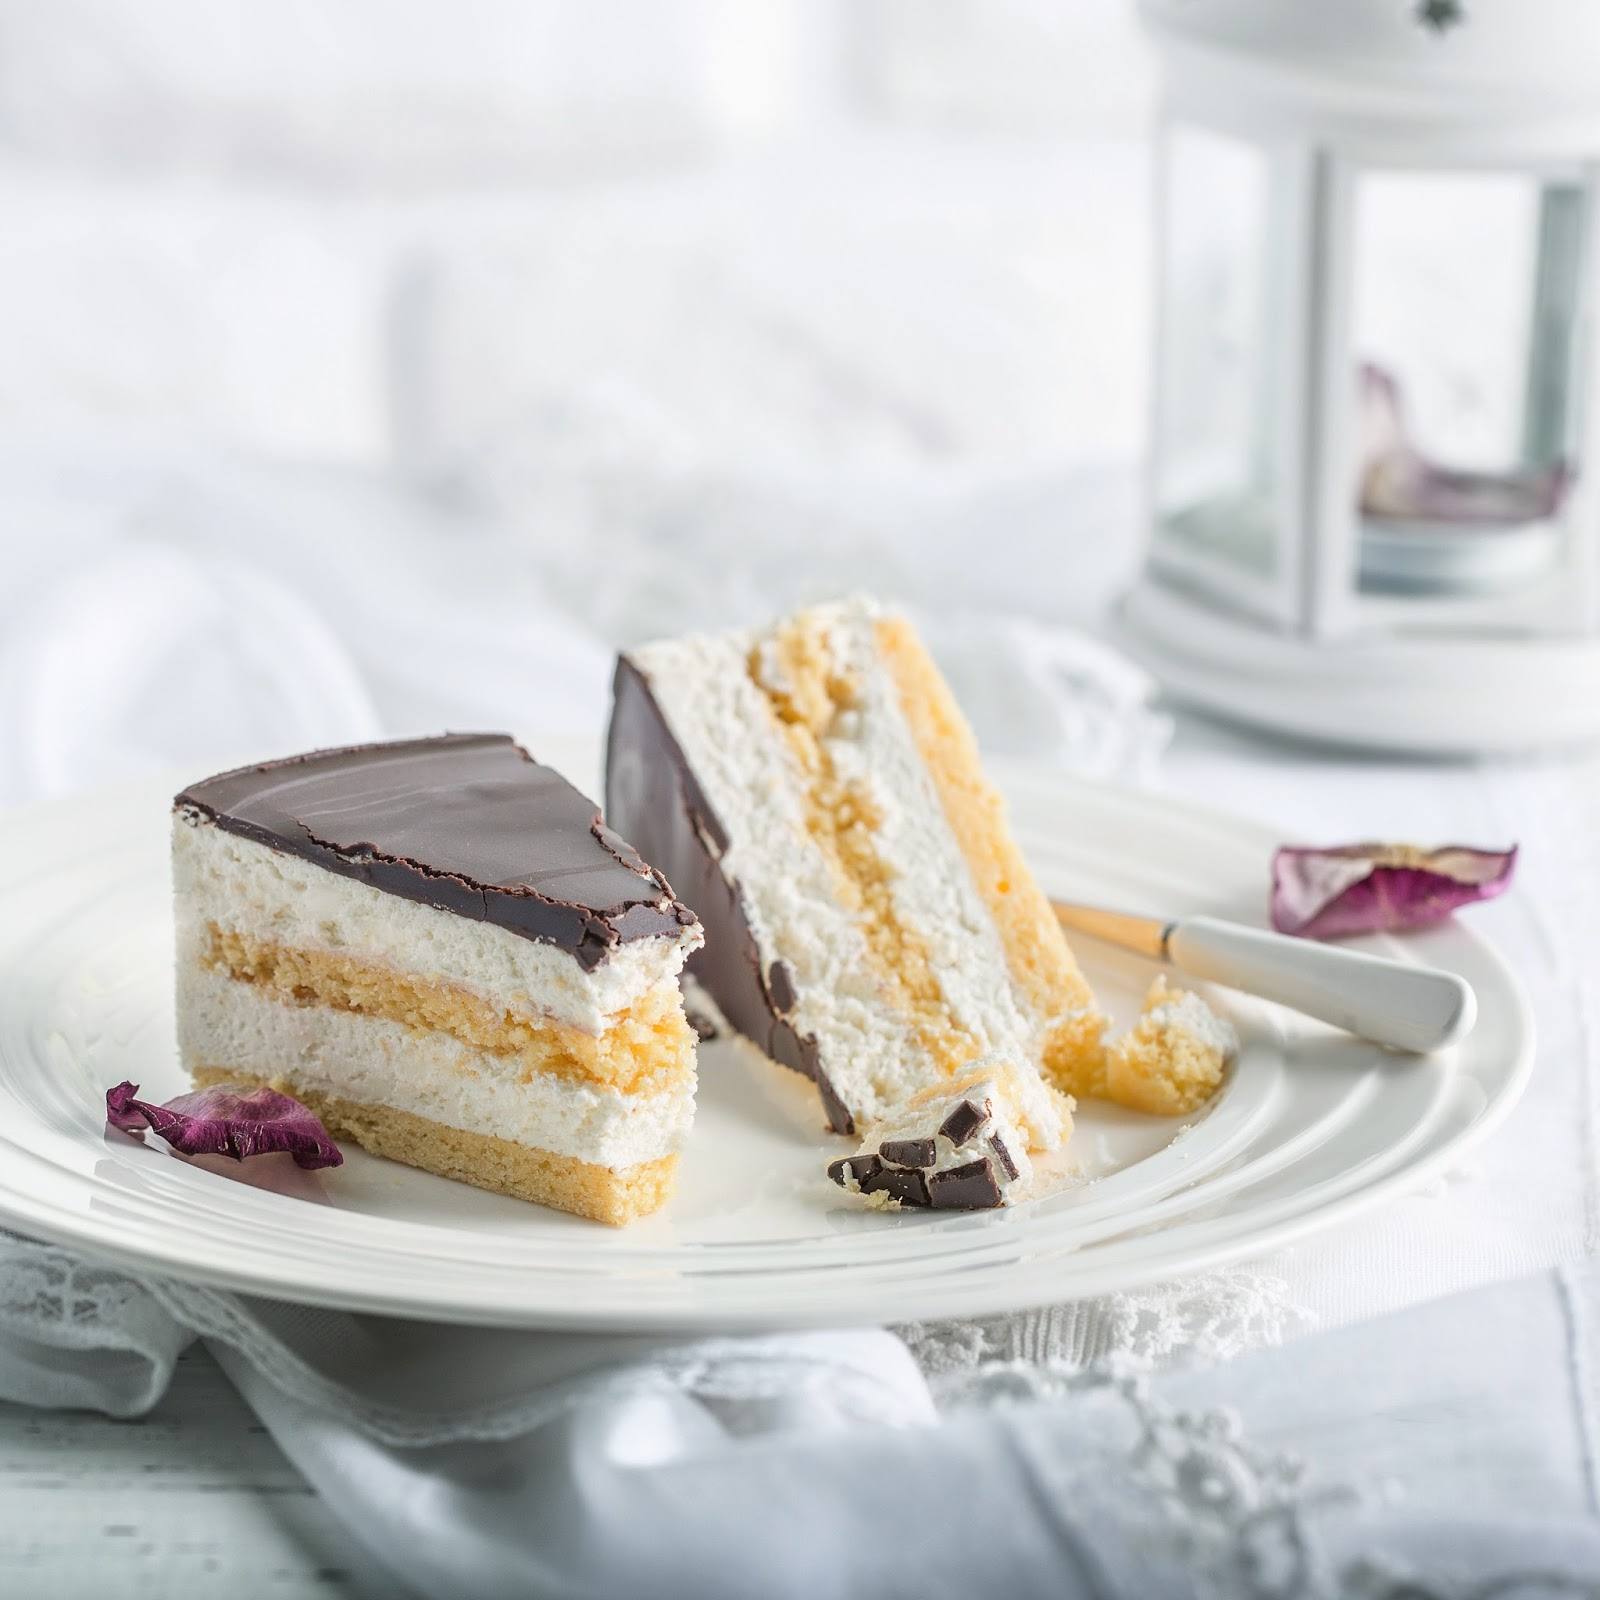 Торт-суфле птичье молоко пошагово